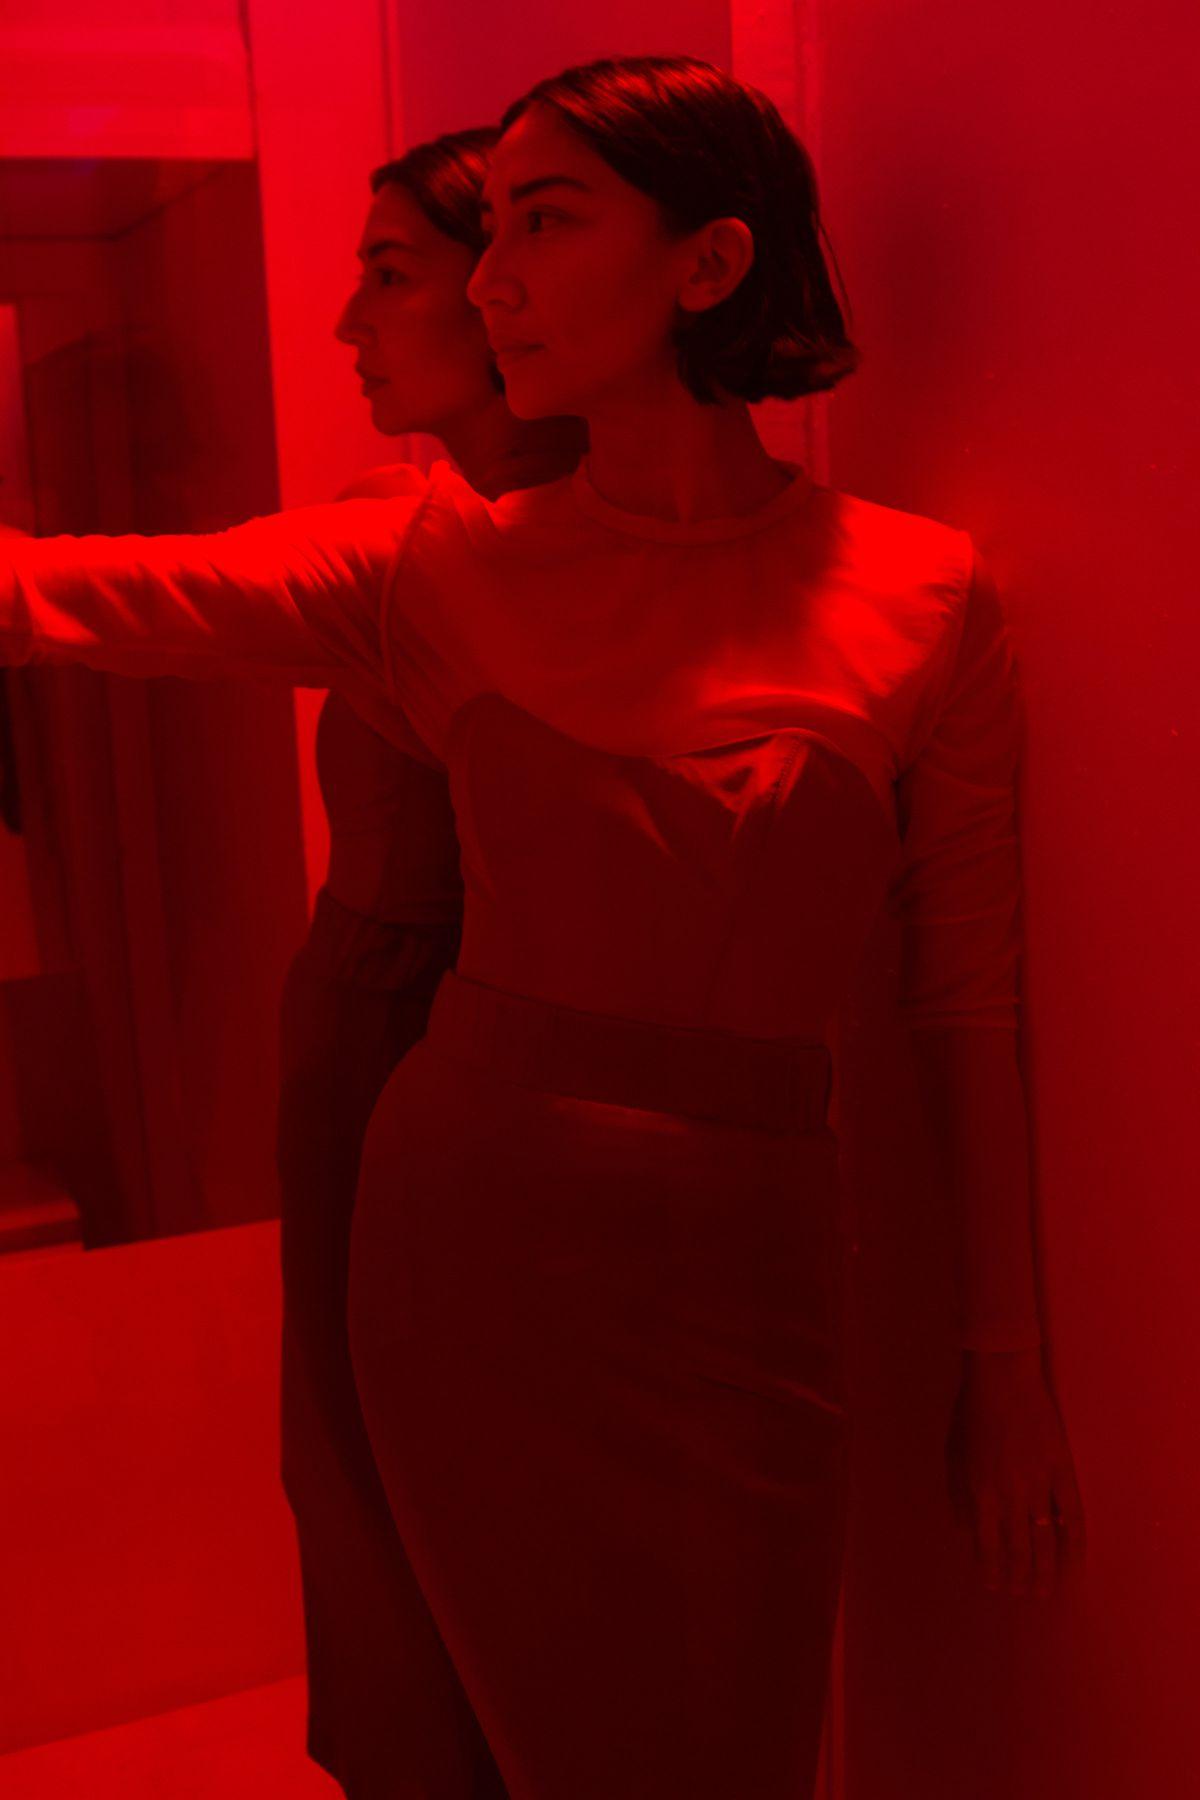 Designer Suzanne Rae inside a mirrored box at her fashion week presentation.